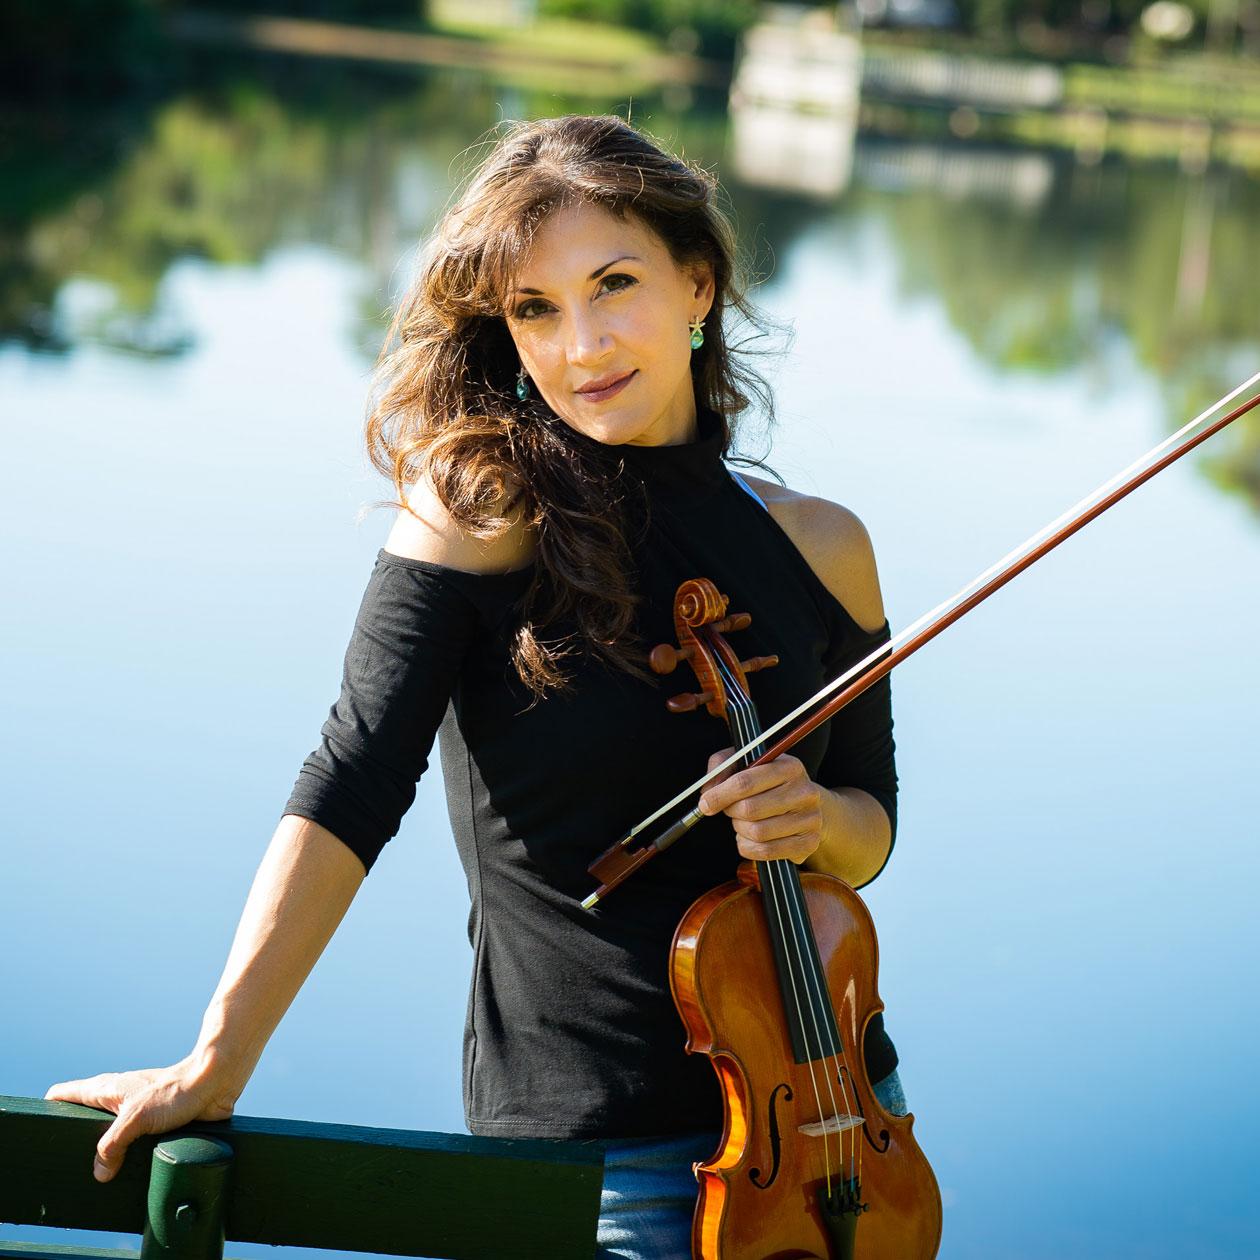 Mariana Lake Violinist #2